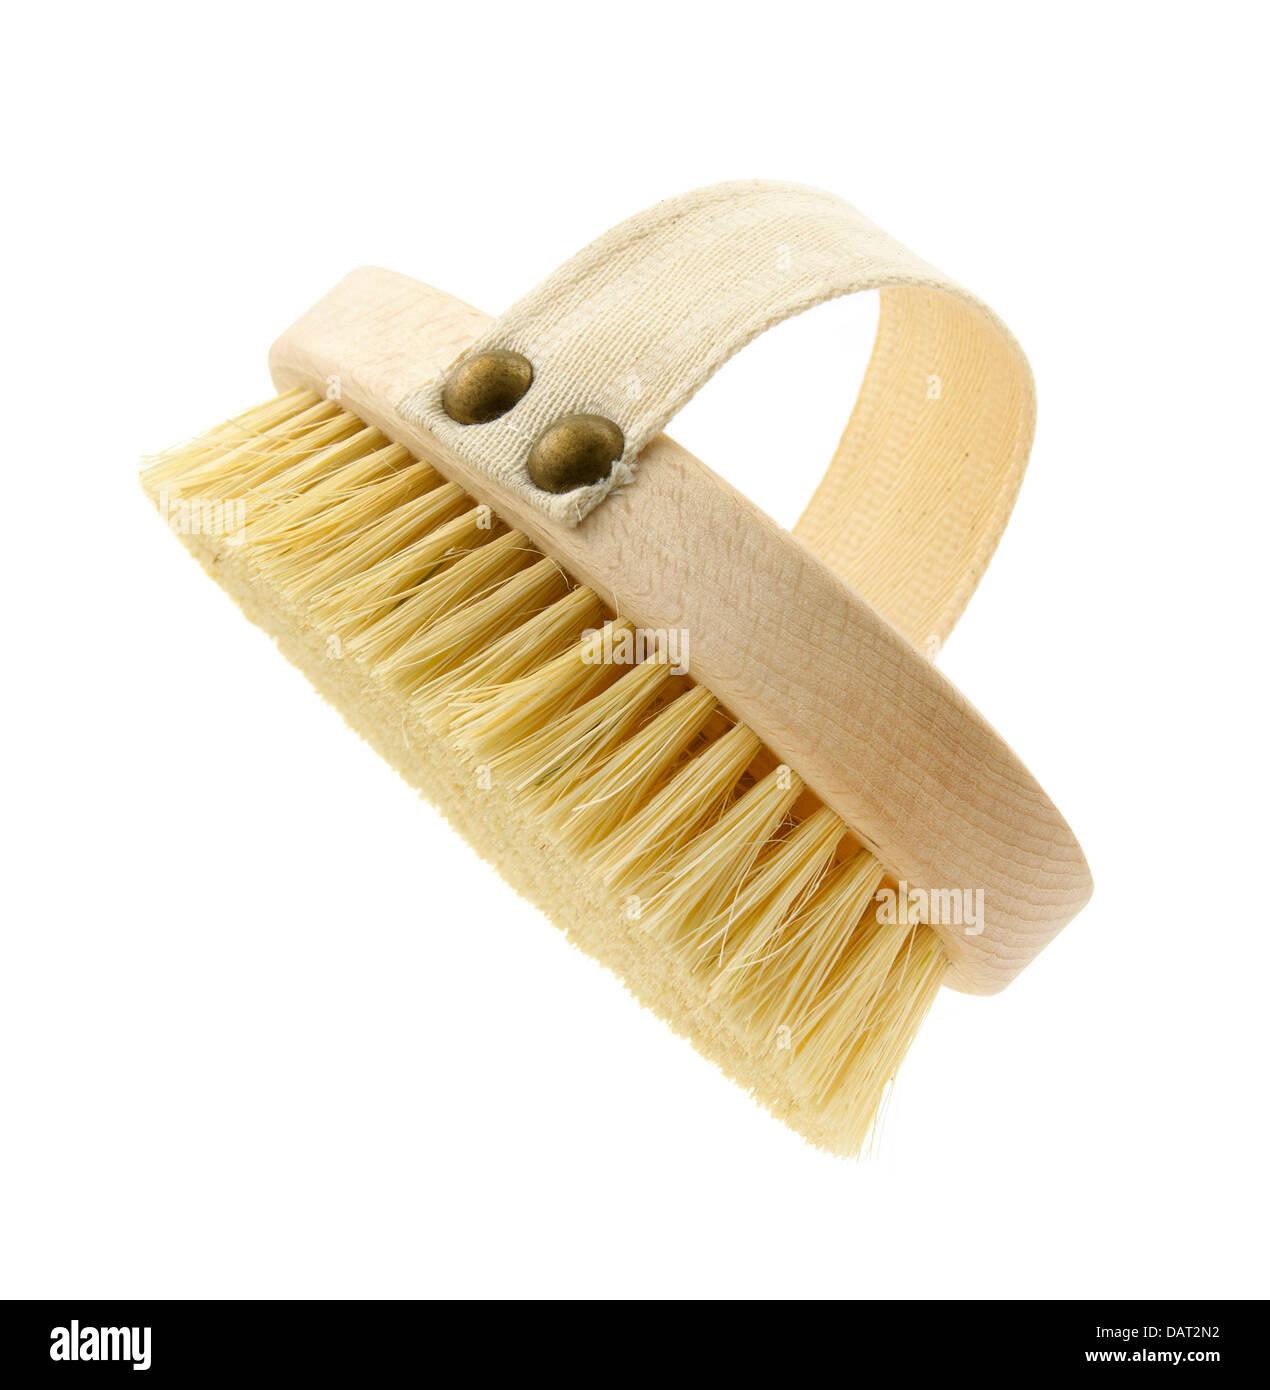 bath scrubbing brush cut out onto a white backgorund - Stock Image